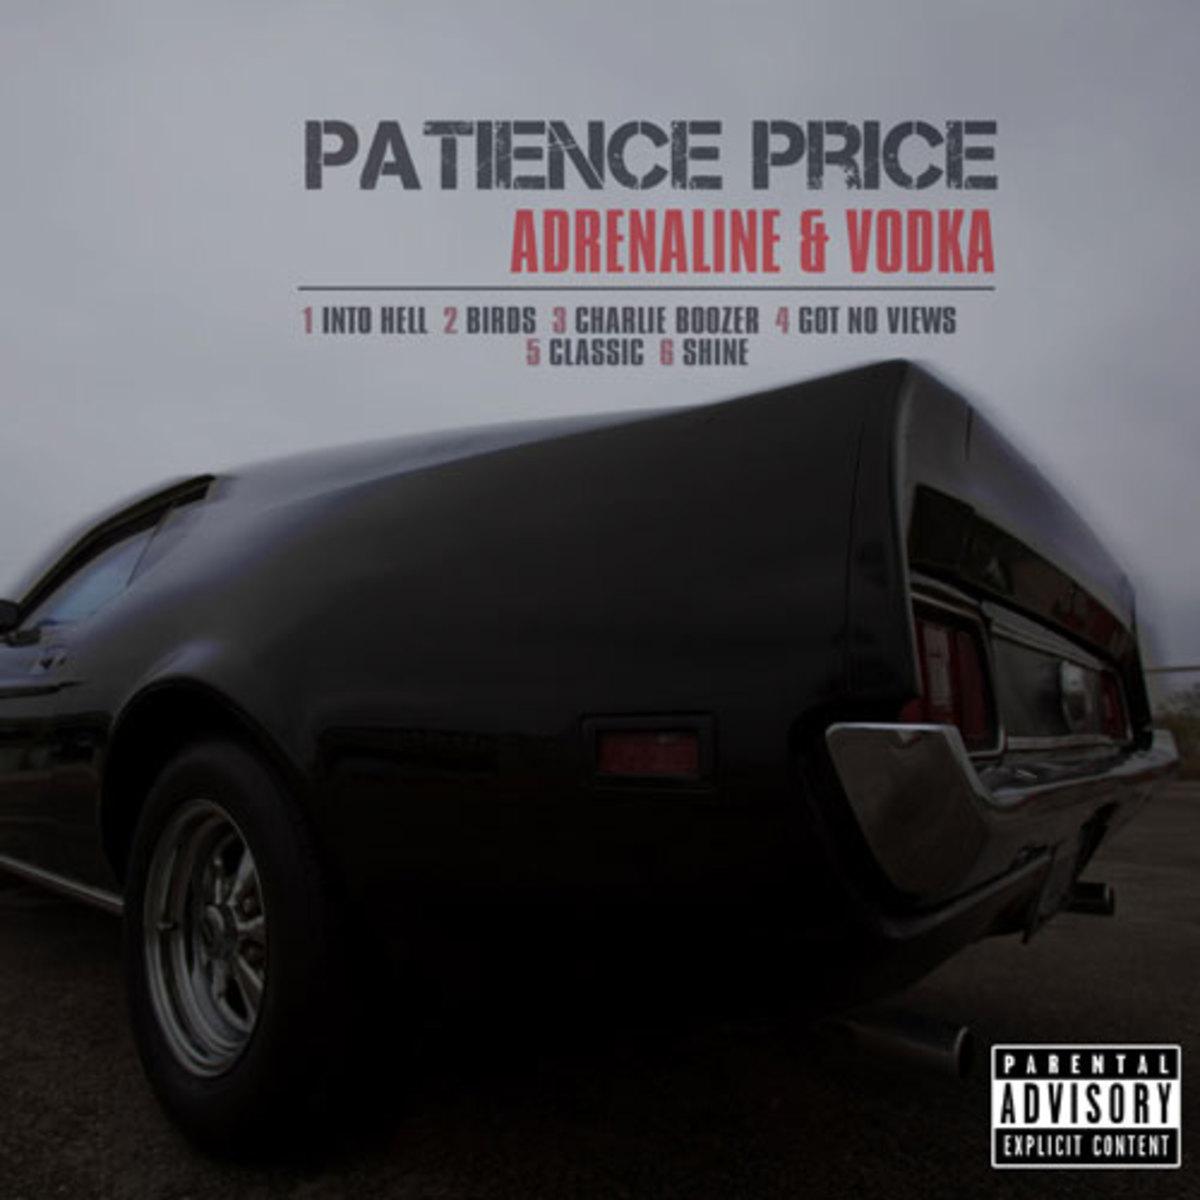 patienceprice-adrenandvodka.jpg